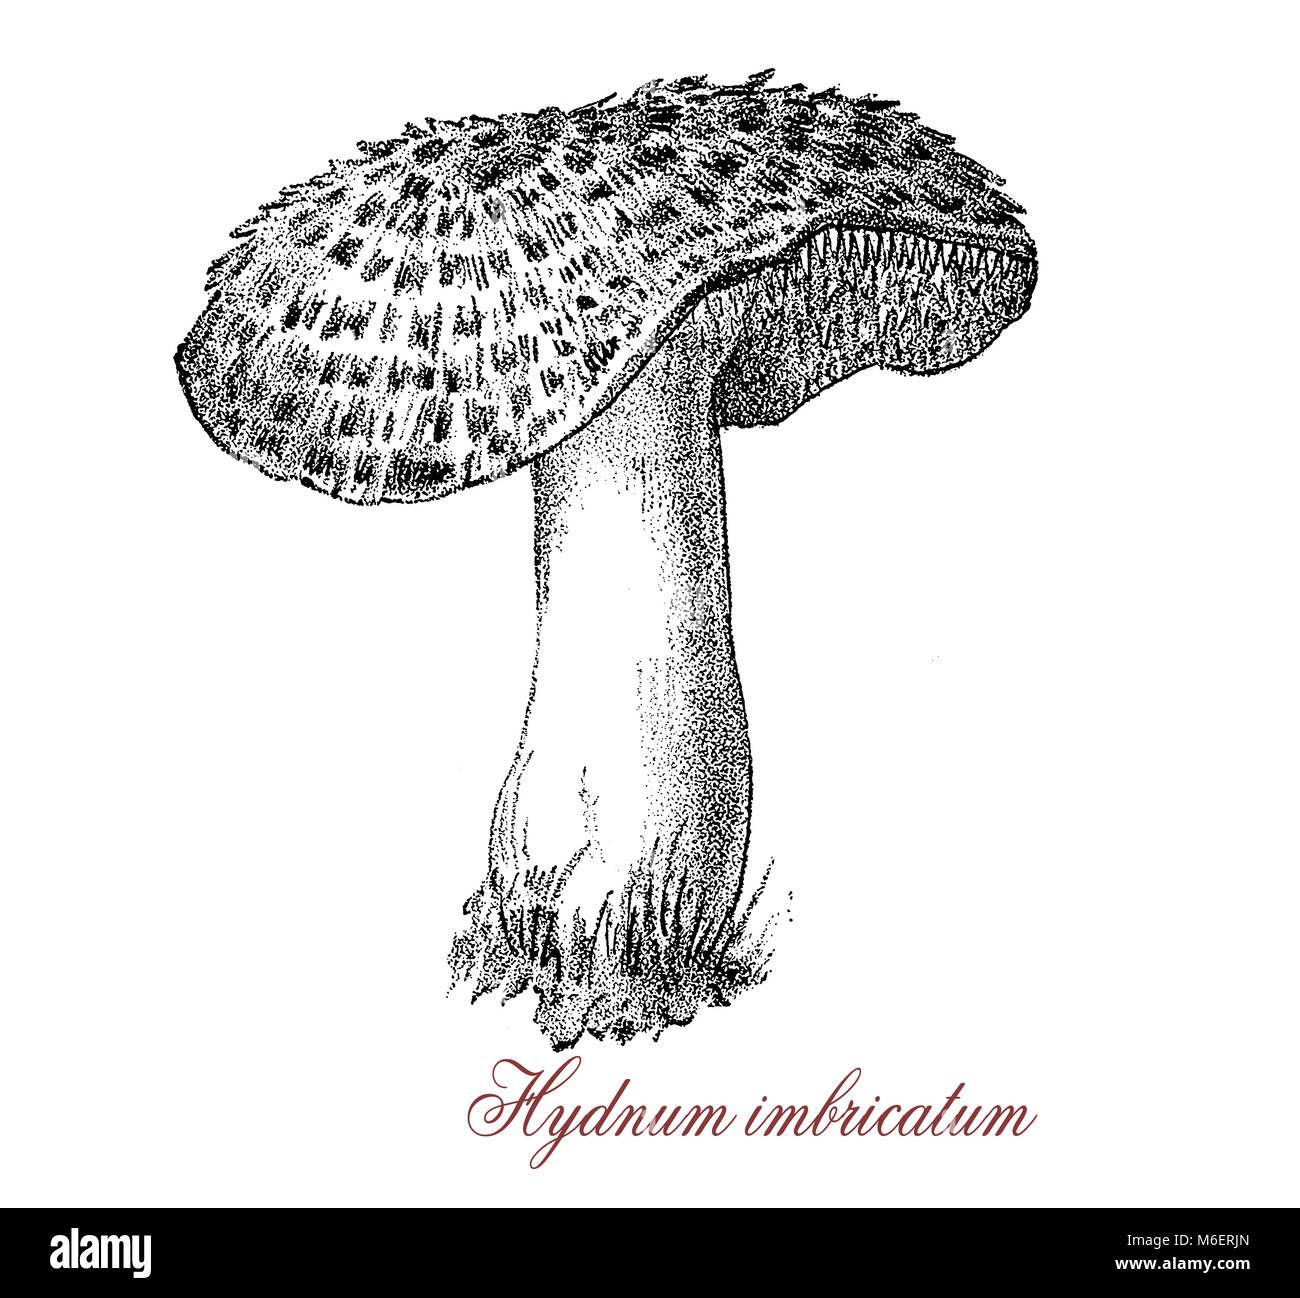 Vintage engraving of  sarcodon imbricatum  or shingled edgehog, edible mushroom with white flash and brown cap large - Stock Image